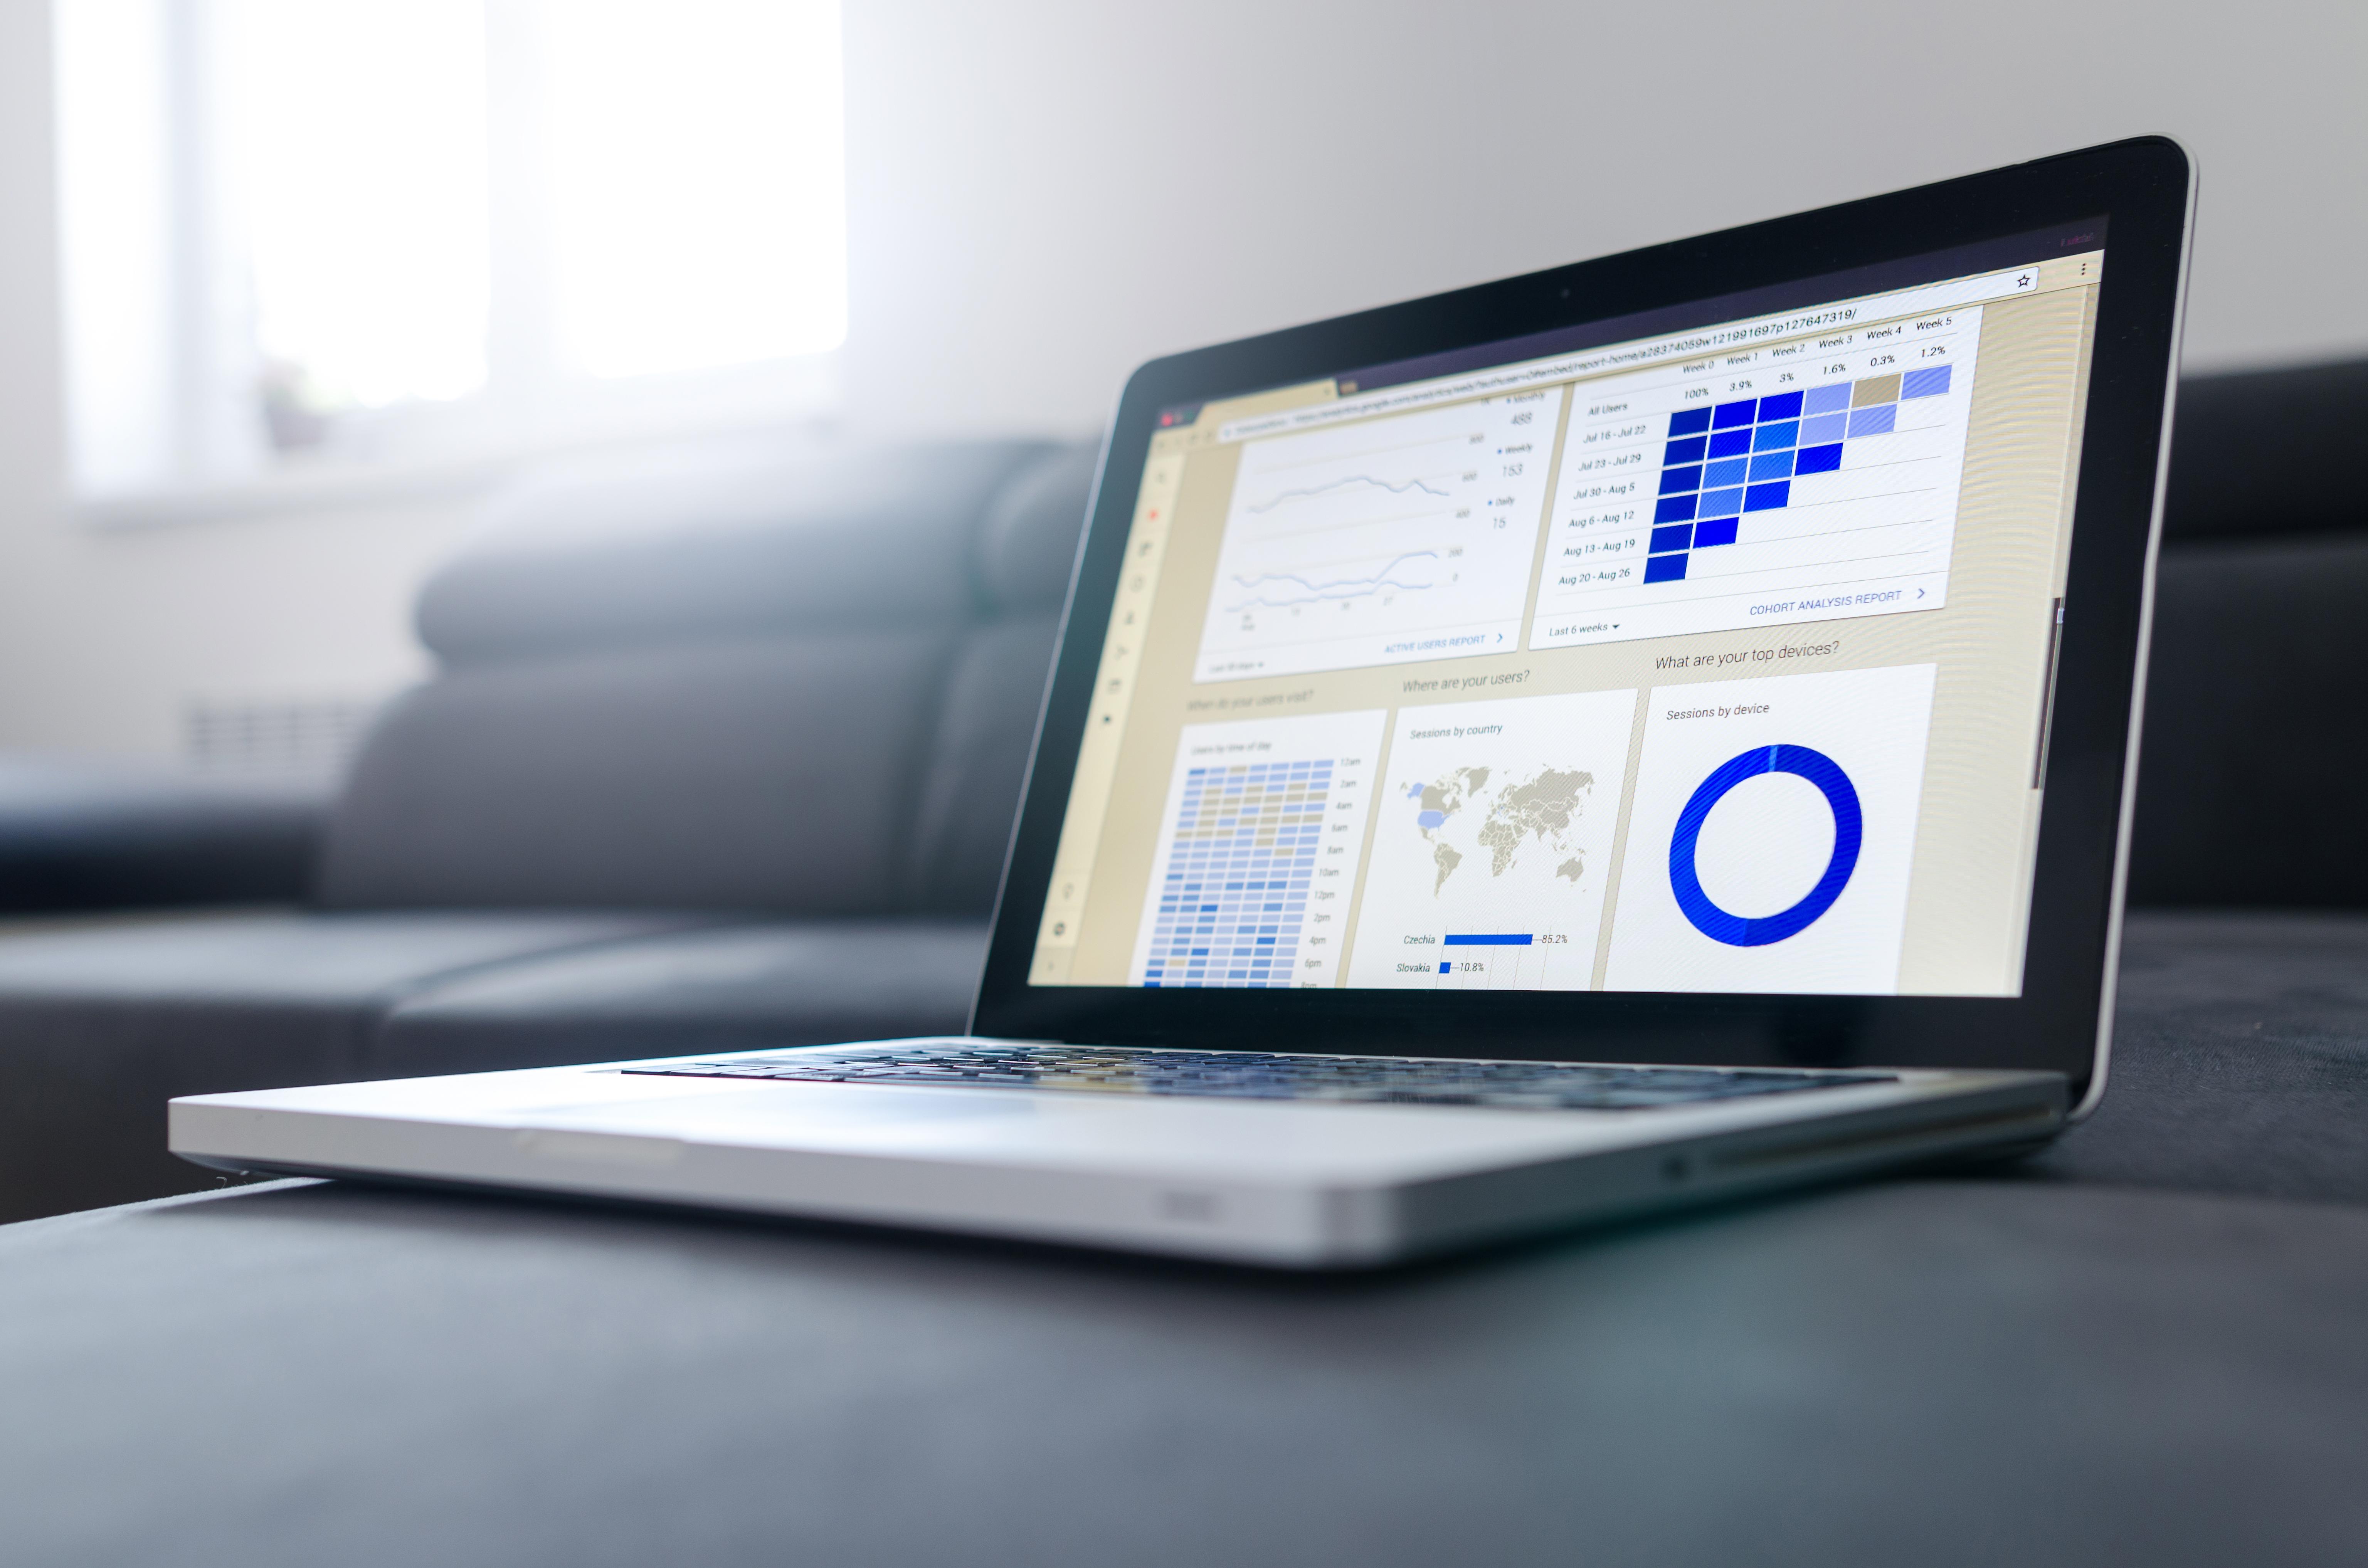 Gambar Laptop Teknologi Komunikasi Alat Merek Multimedia